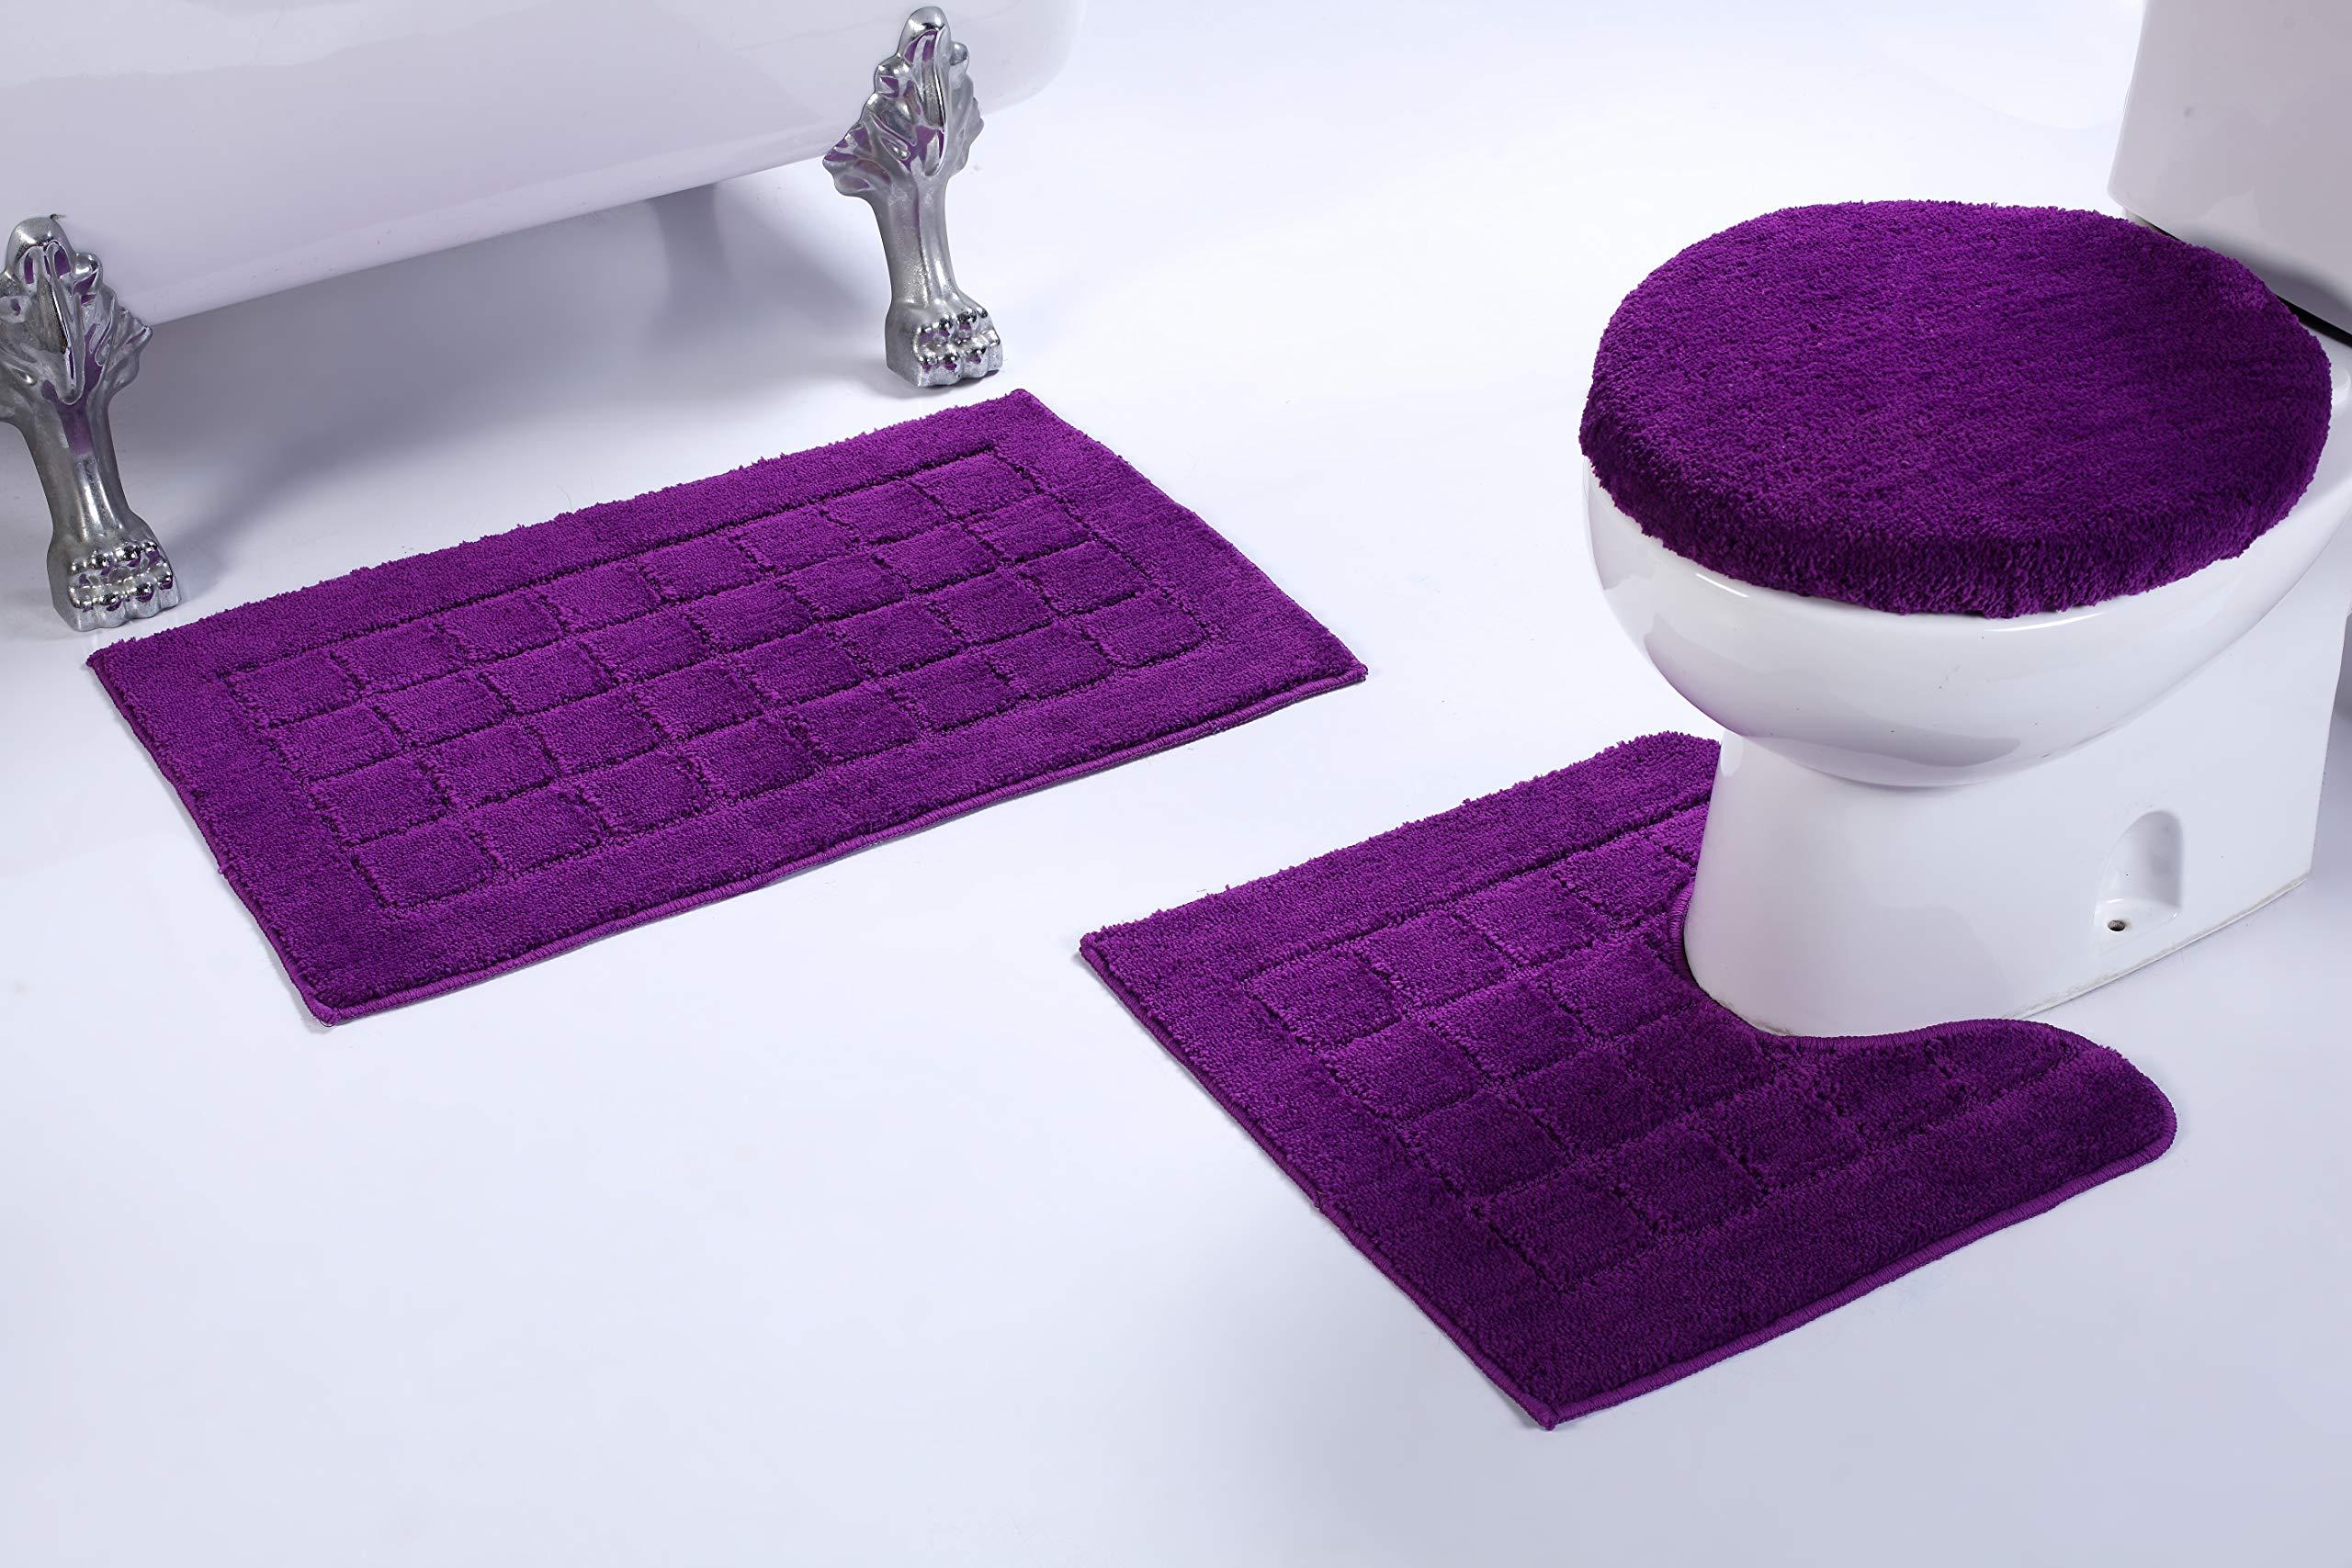 Fancy Linen 3pc Non-Slip Bath Mat Set with Square Pattern Solid Purple Bathroom U-Shaped Contour Rug, Mat and Toilet Lid Cover New # Bath 60 by Fancy Linen LLC